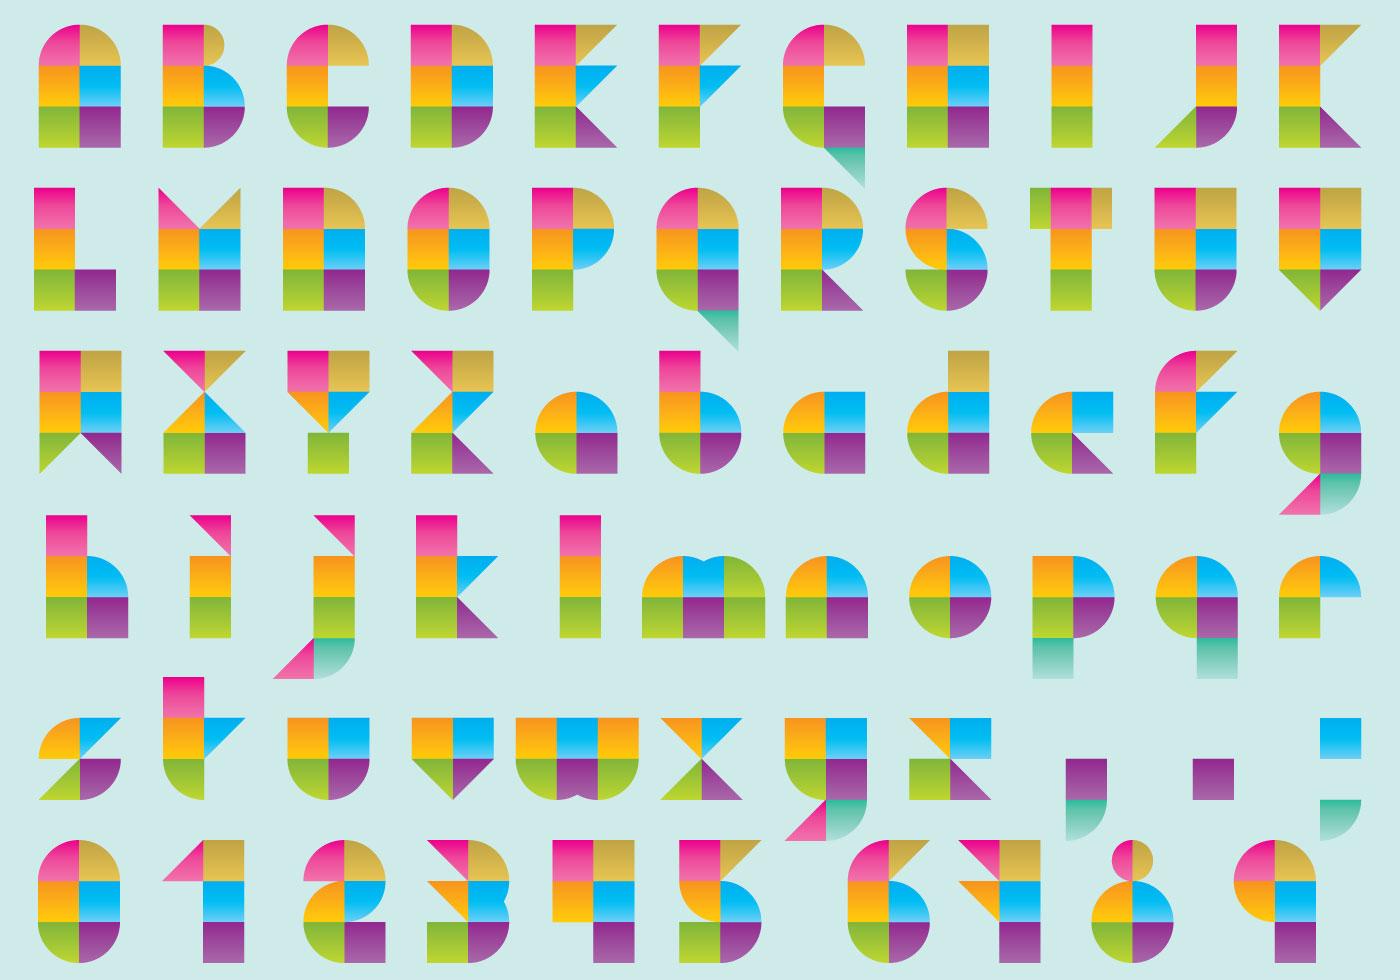 bauhaus modular type download free vector art stock graphics images